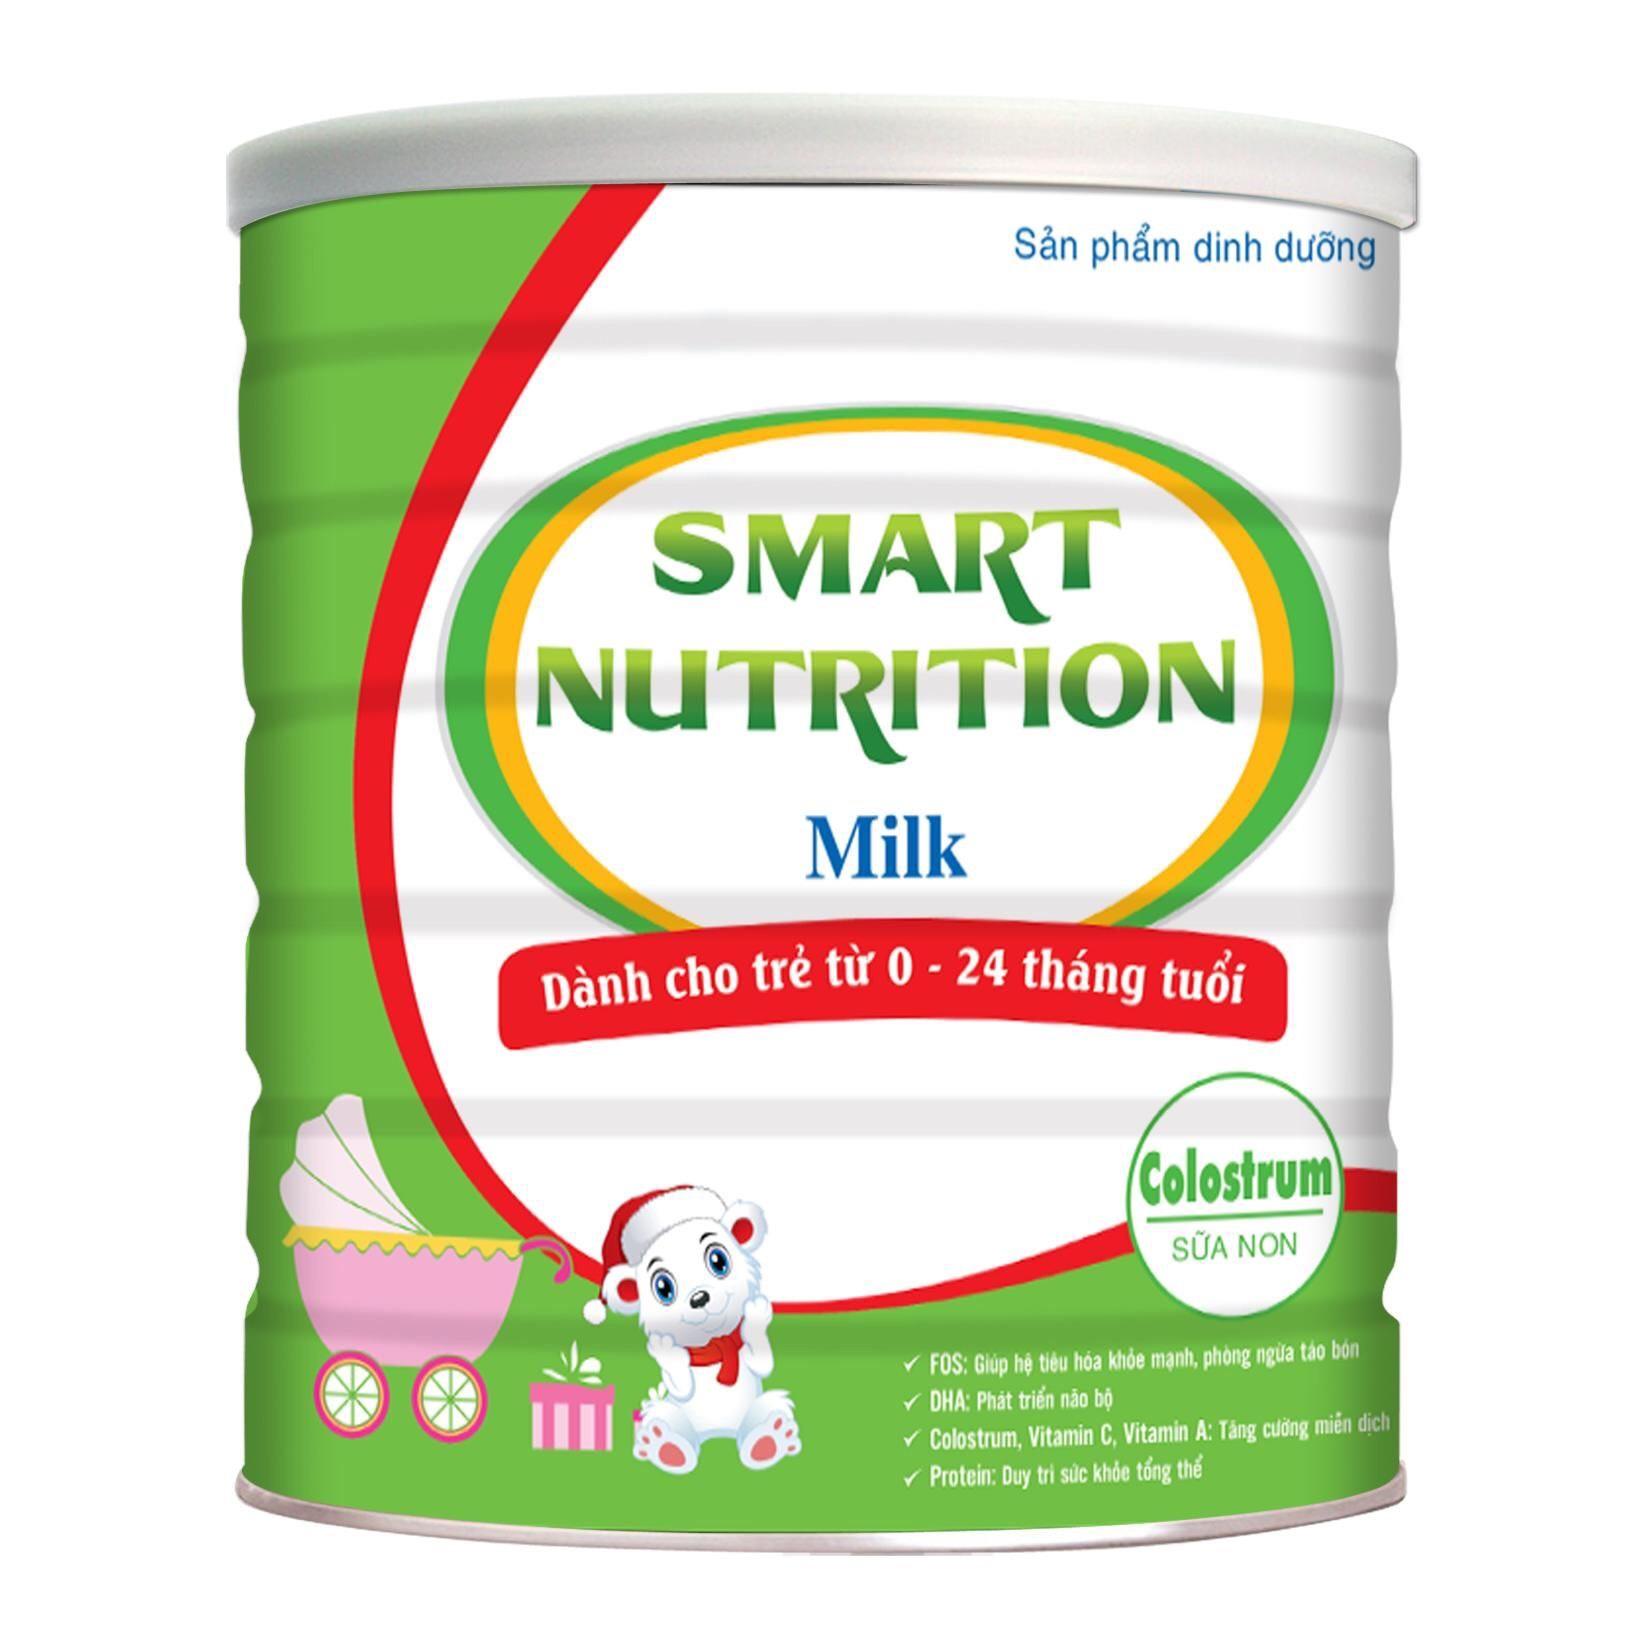 SMART NUTRITION MILK 900g